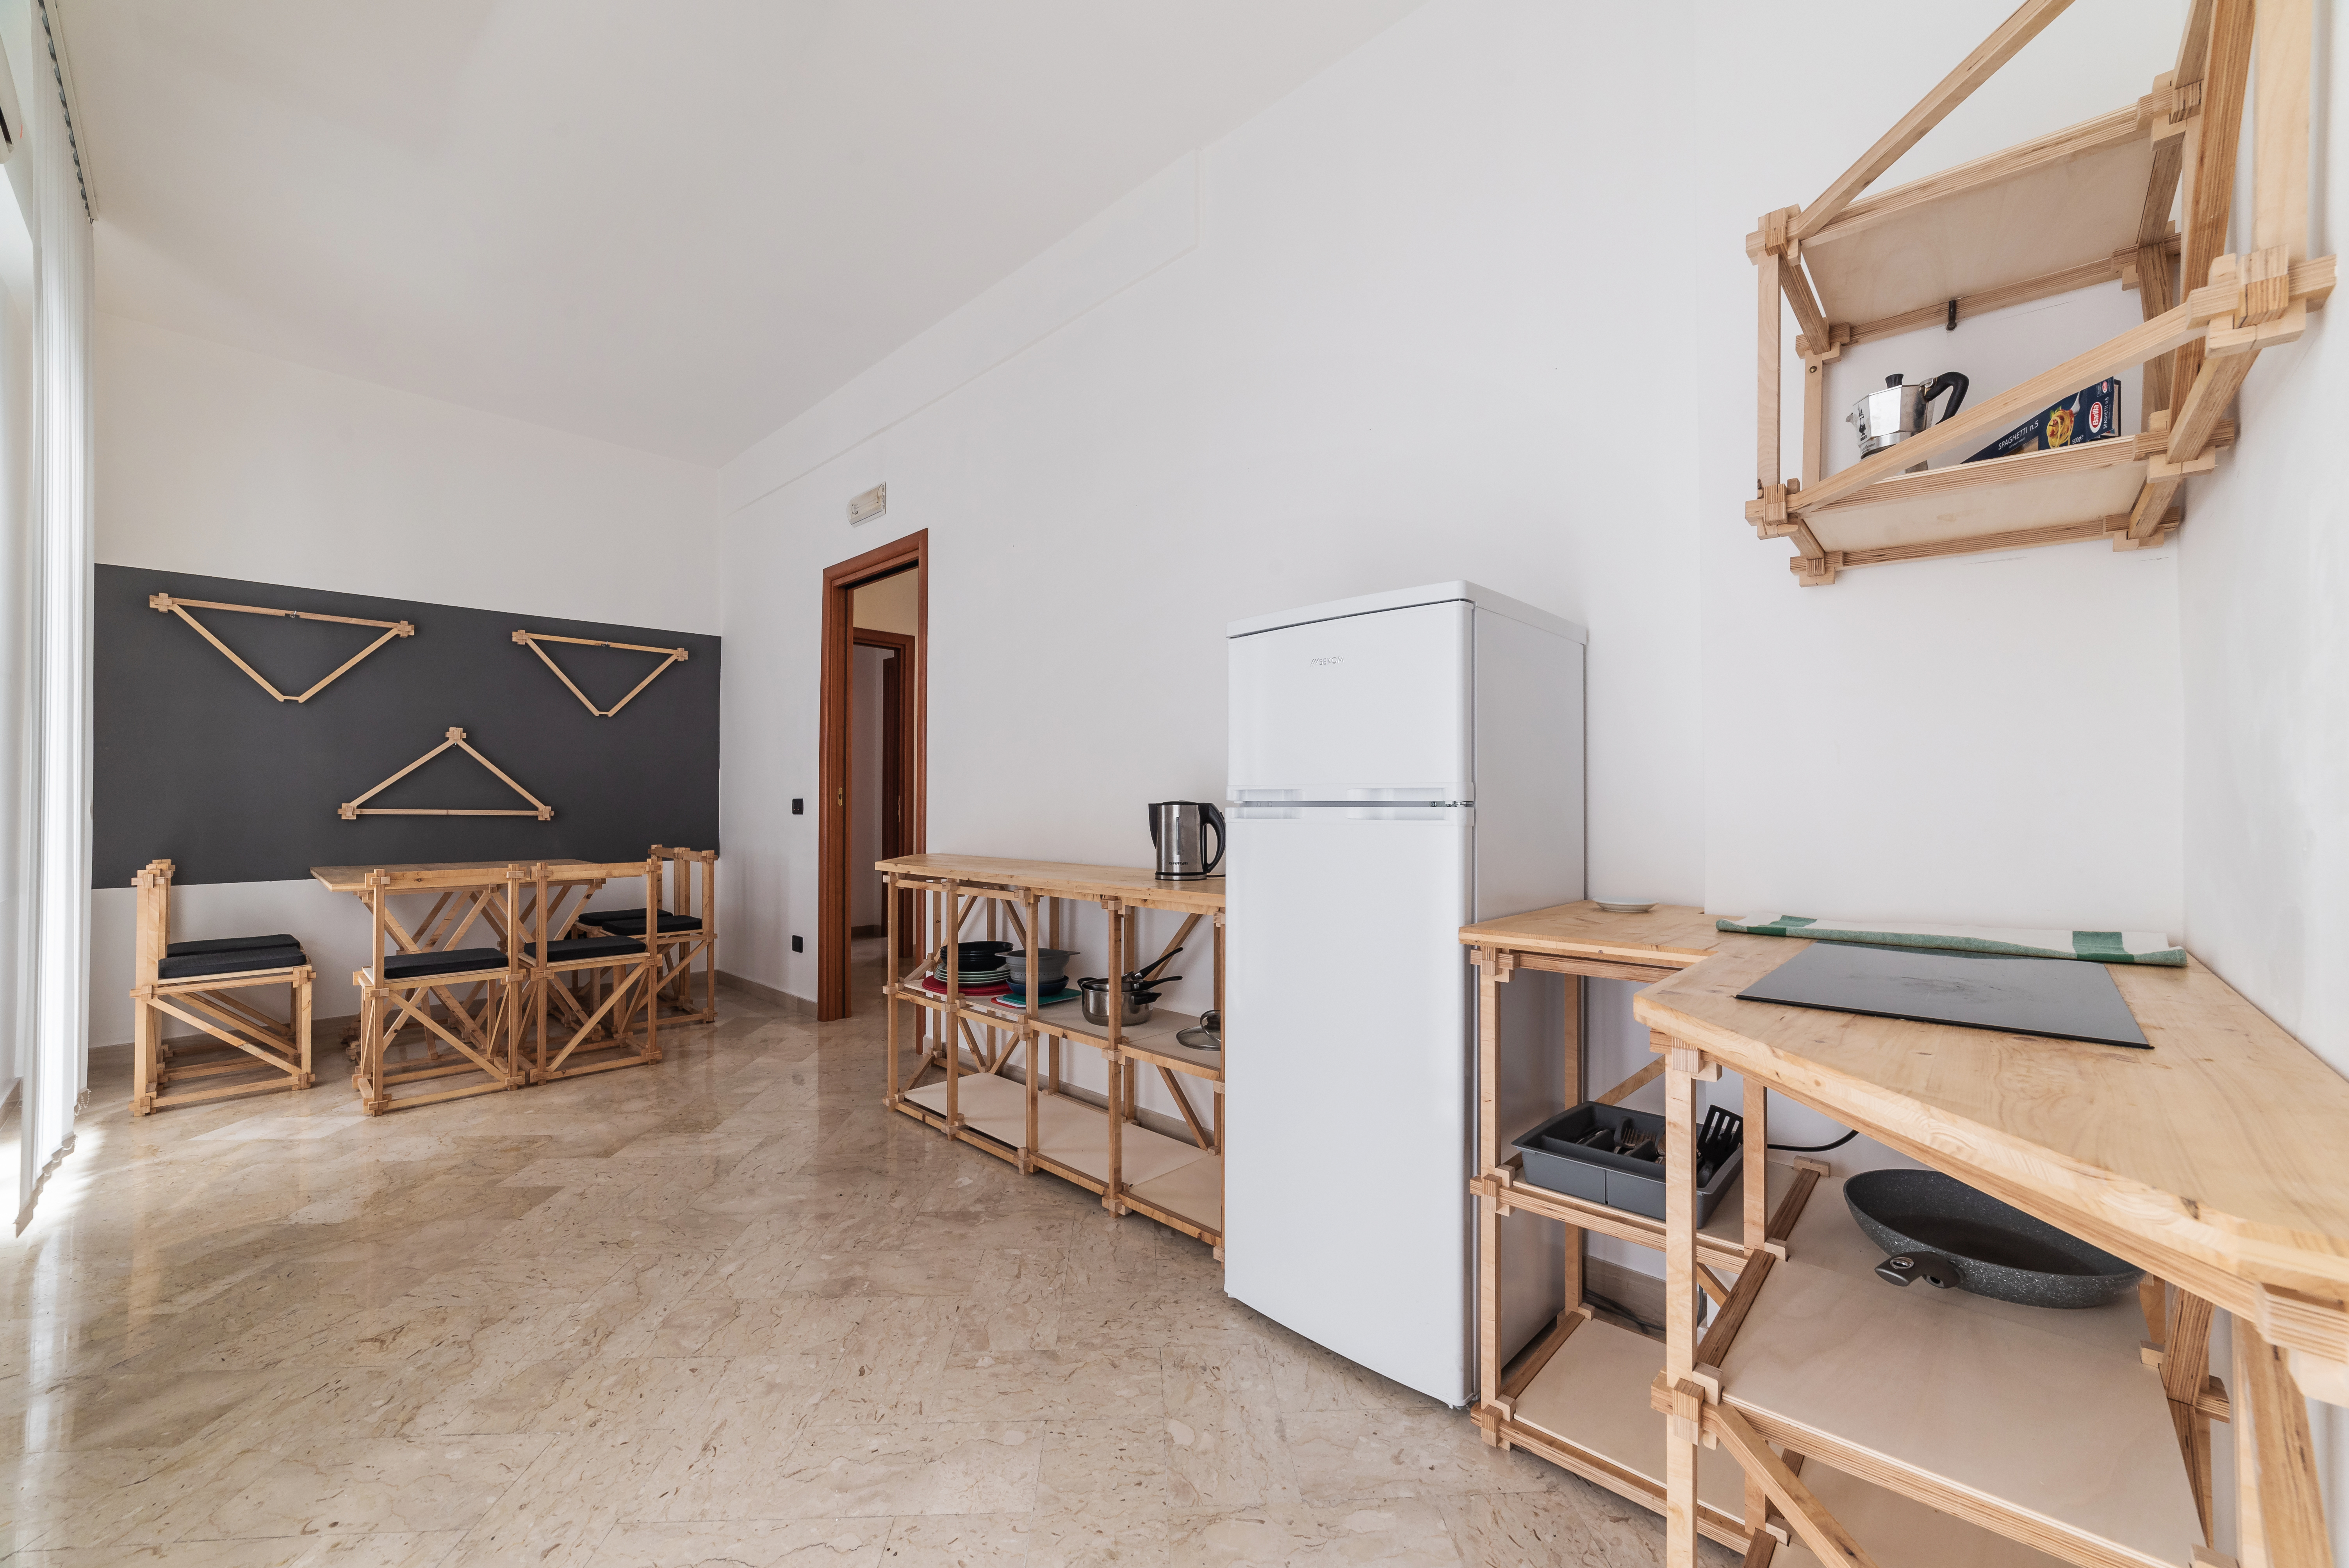 MUJIE DESIGN HOUSE - ALL INCLUSIVE